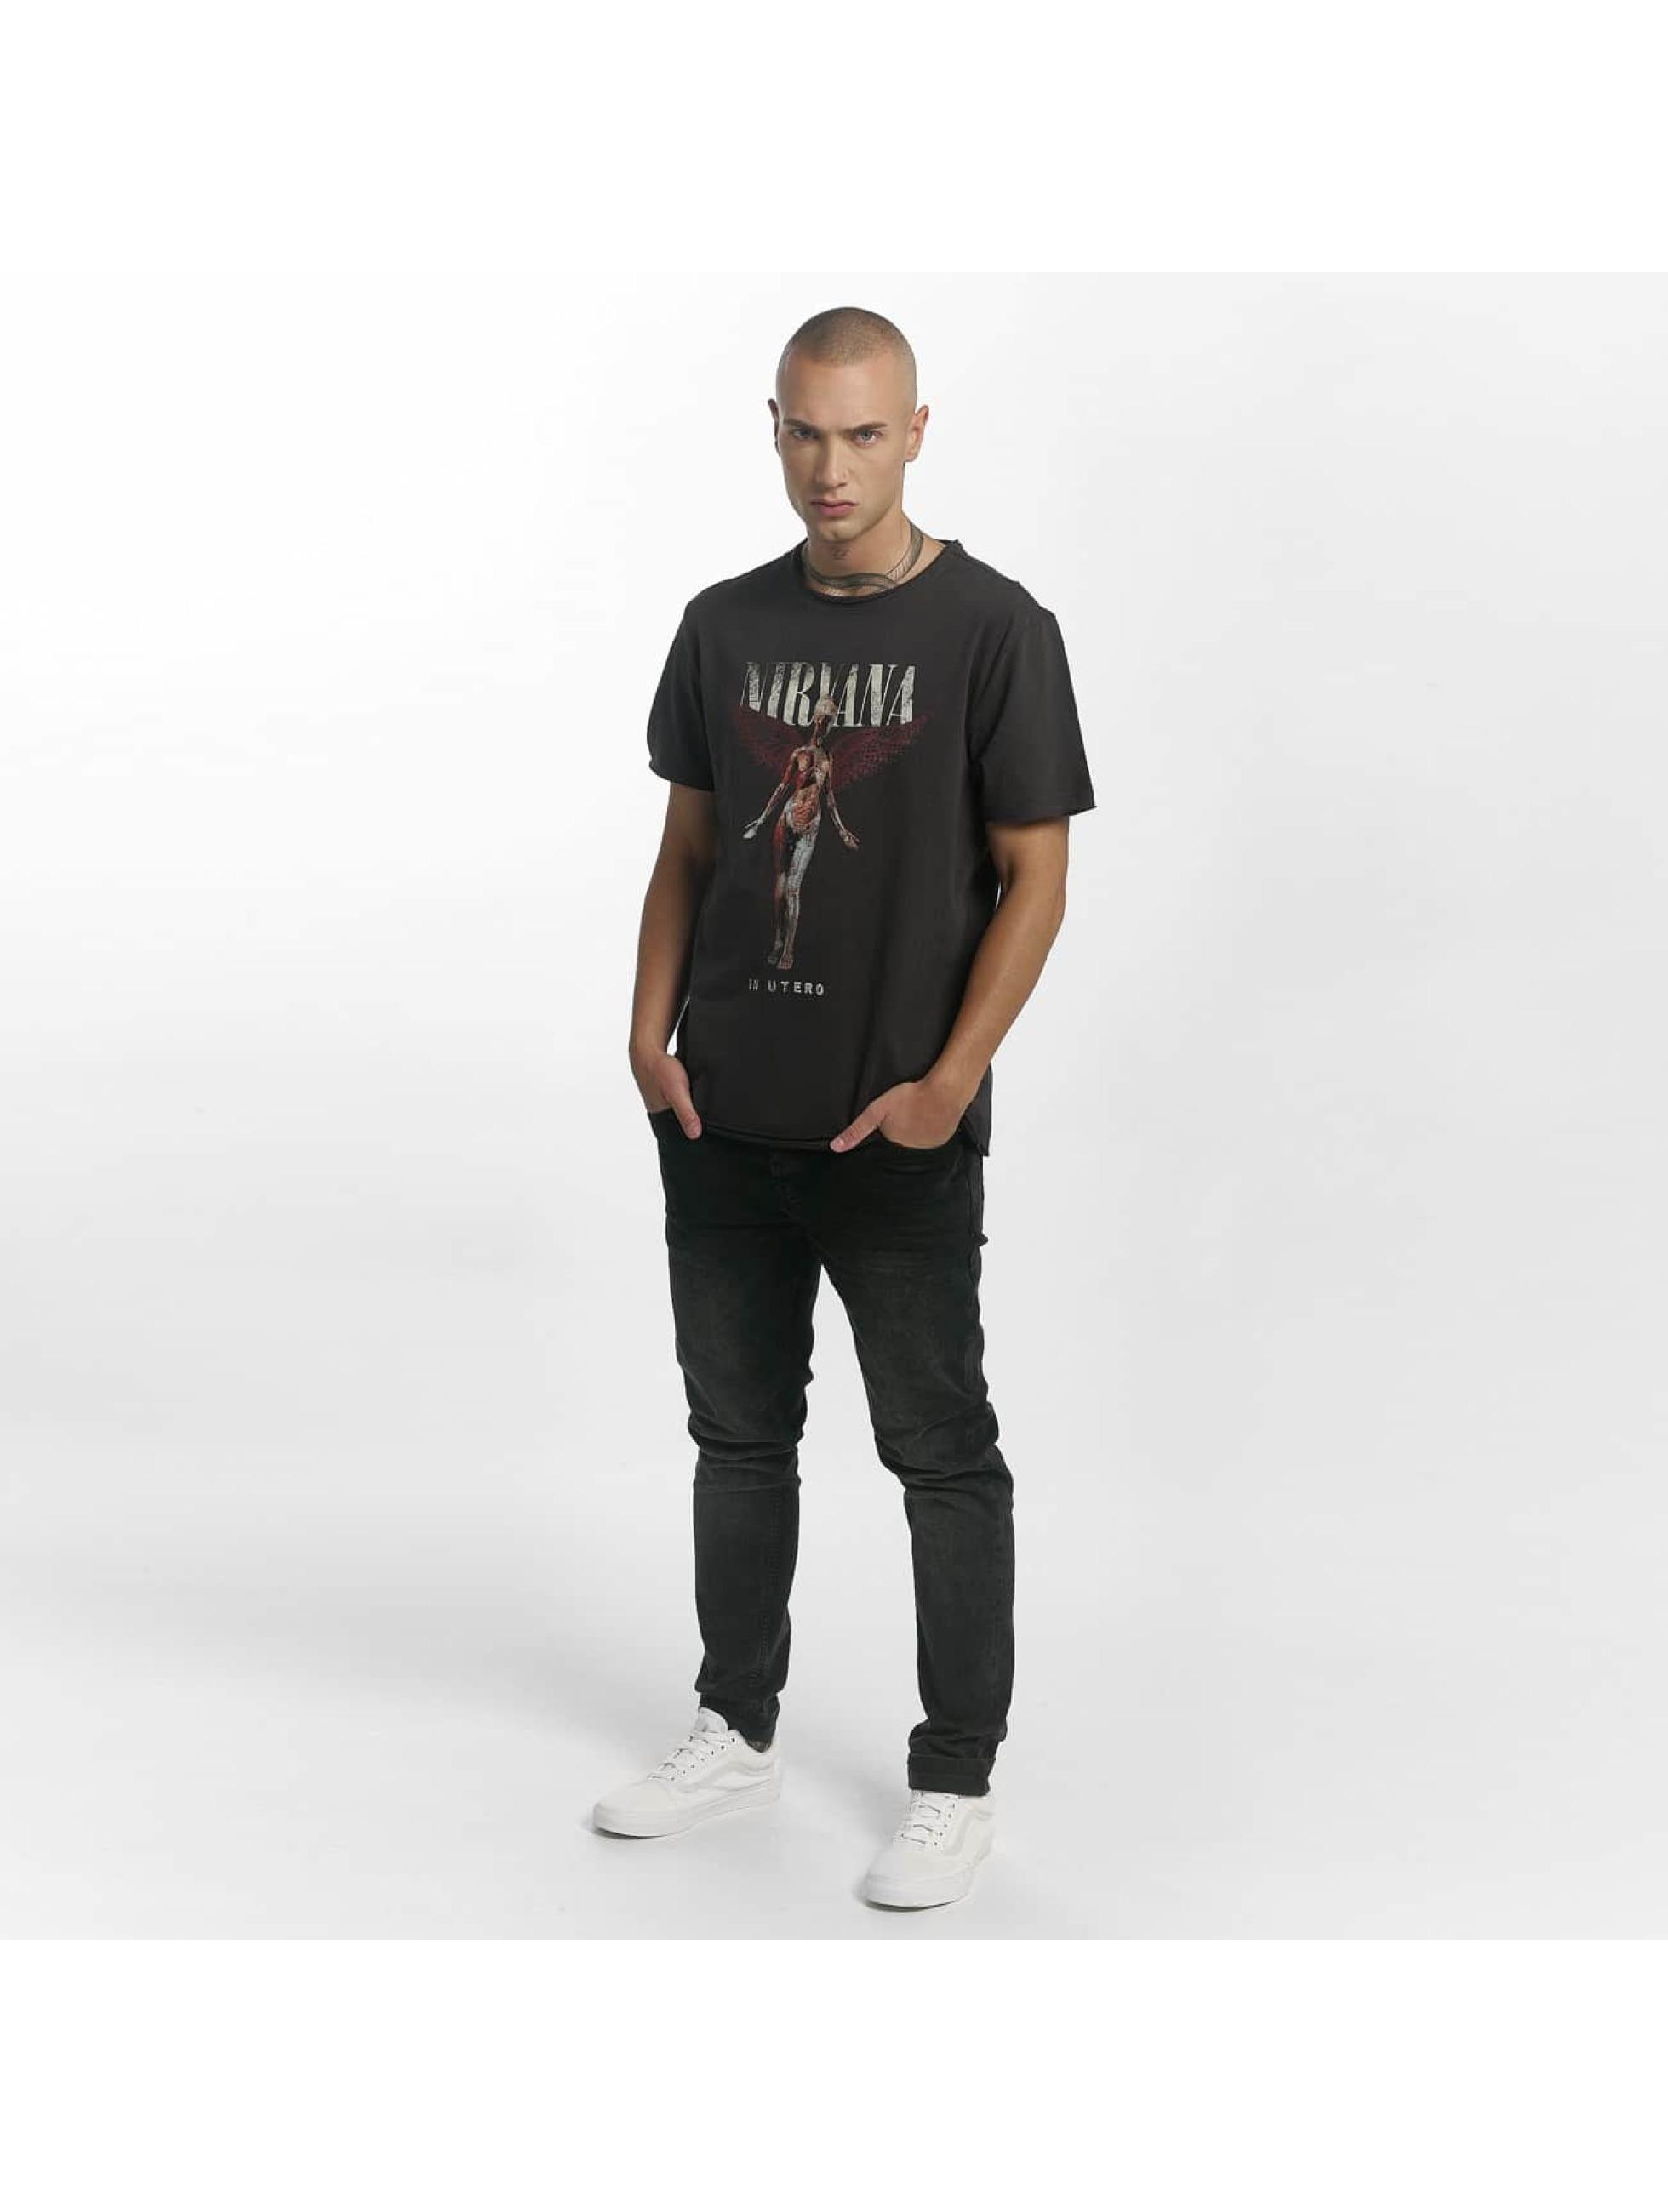 Amplified T-Shirt Nirvana In Utero grau